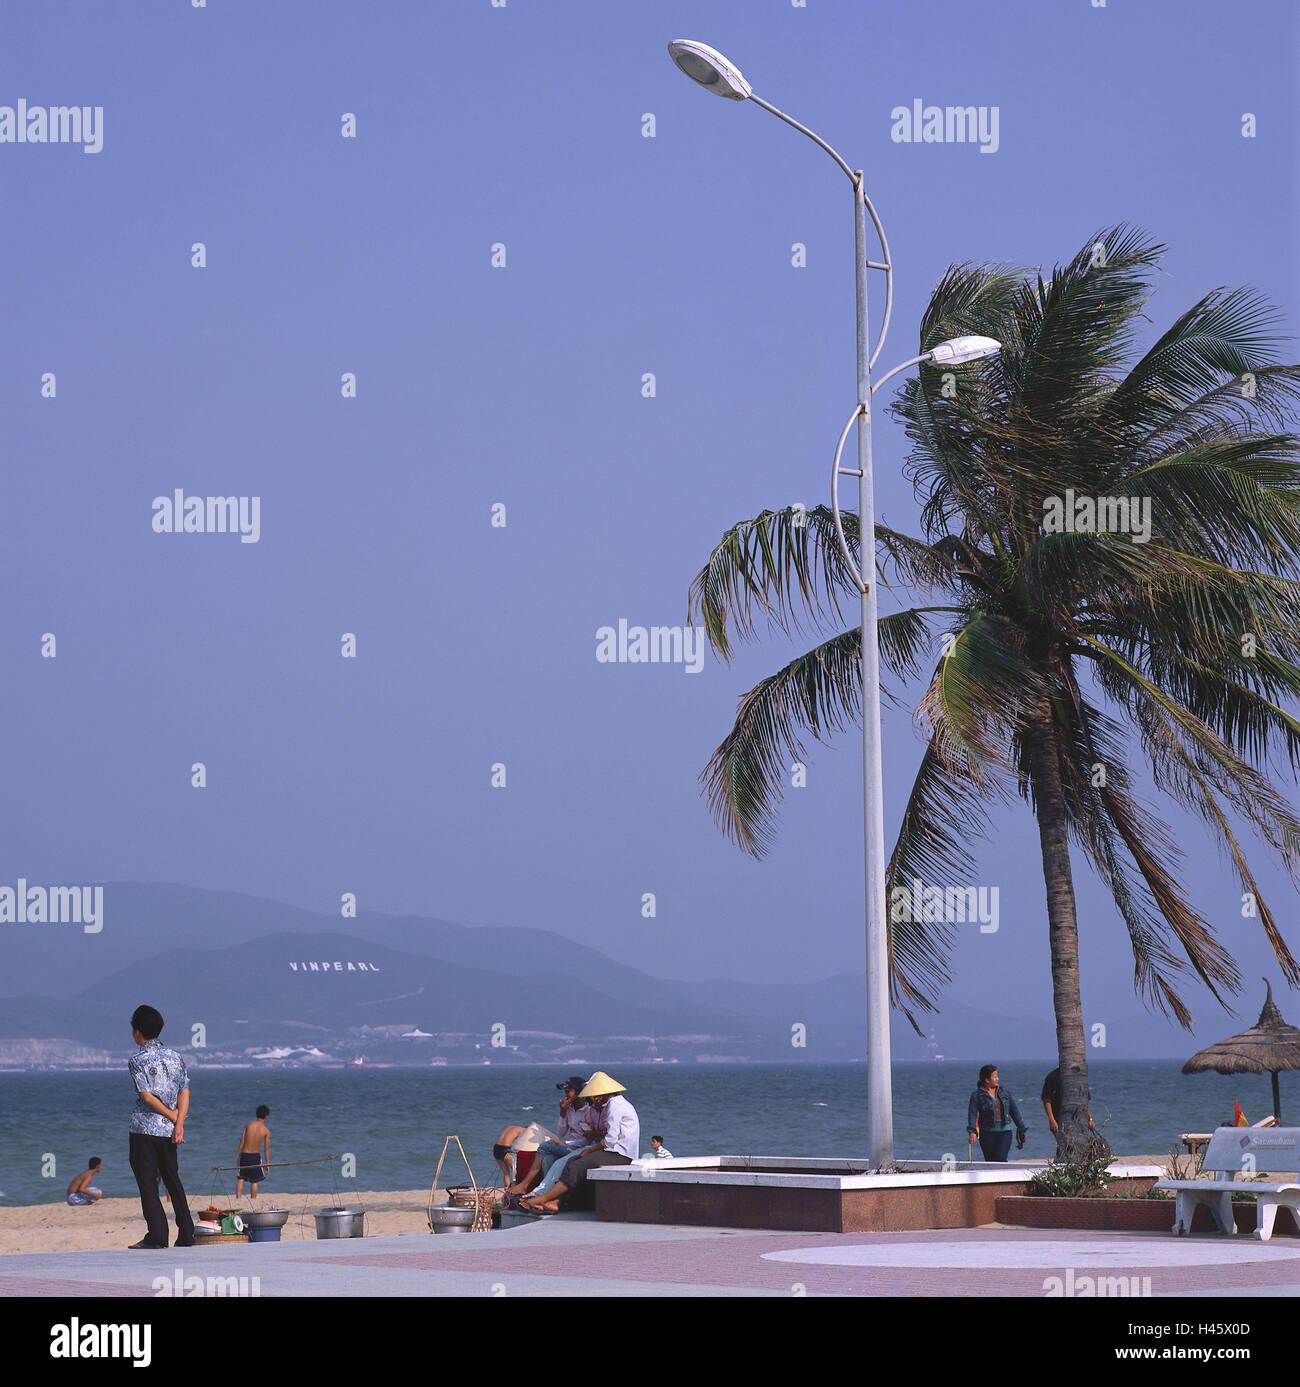 Vietnam, Nha Trang, beach, promenade, tourist, shop assistants, no model release, Asia, South-East Asia, town, person, Stock Photo